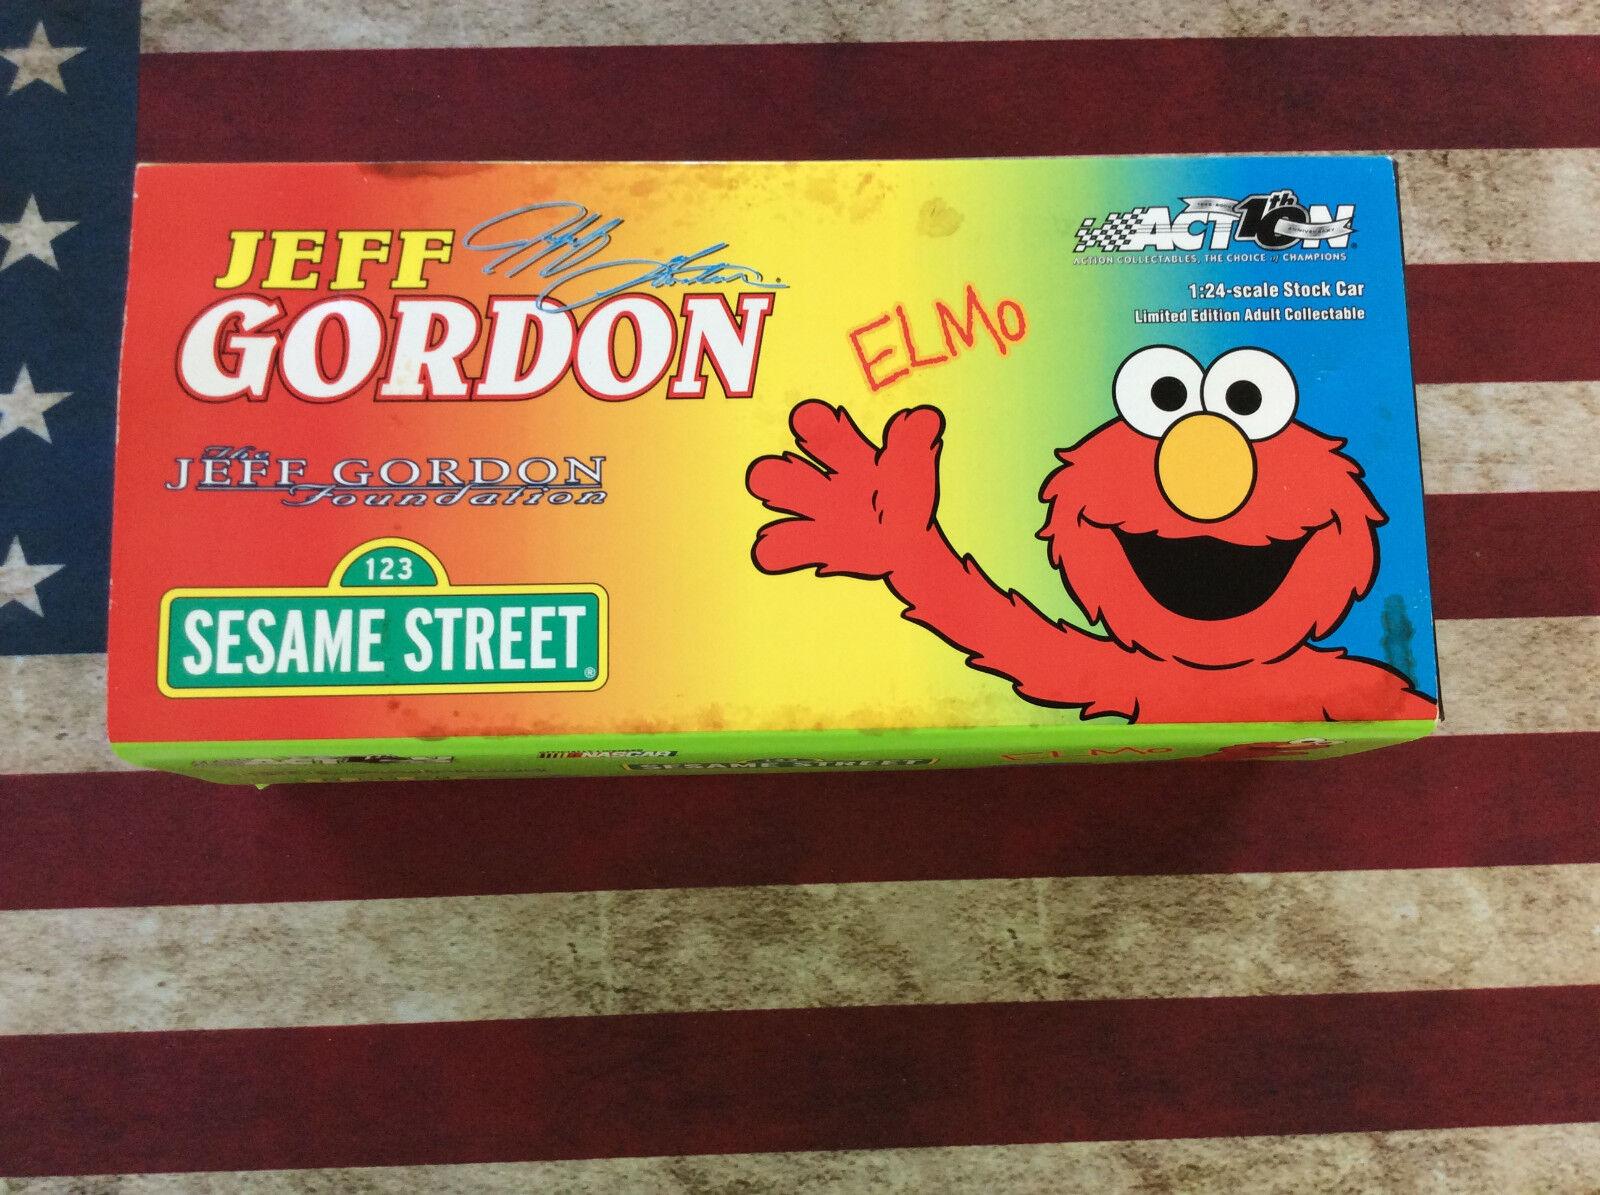 Jeff Gordon Foundation Sesame Street Elmo 1 24 Signed Action car autographed